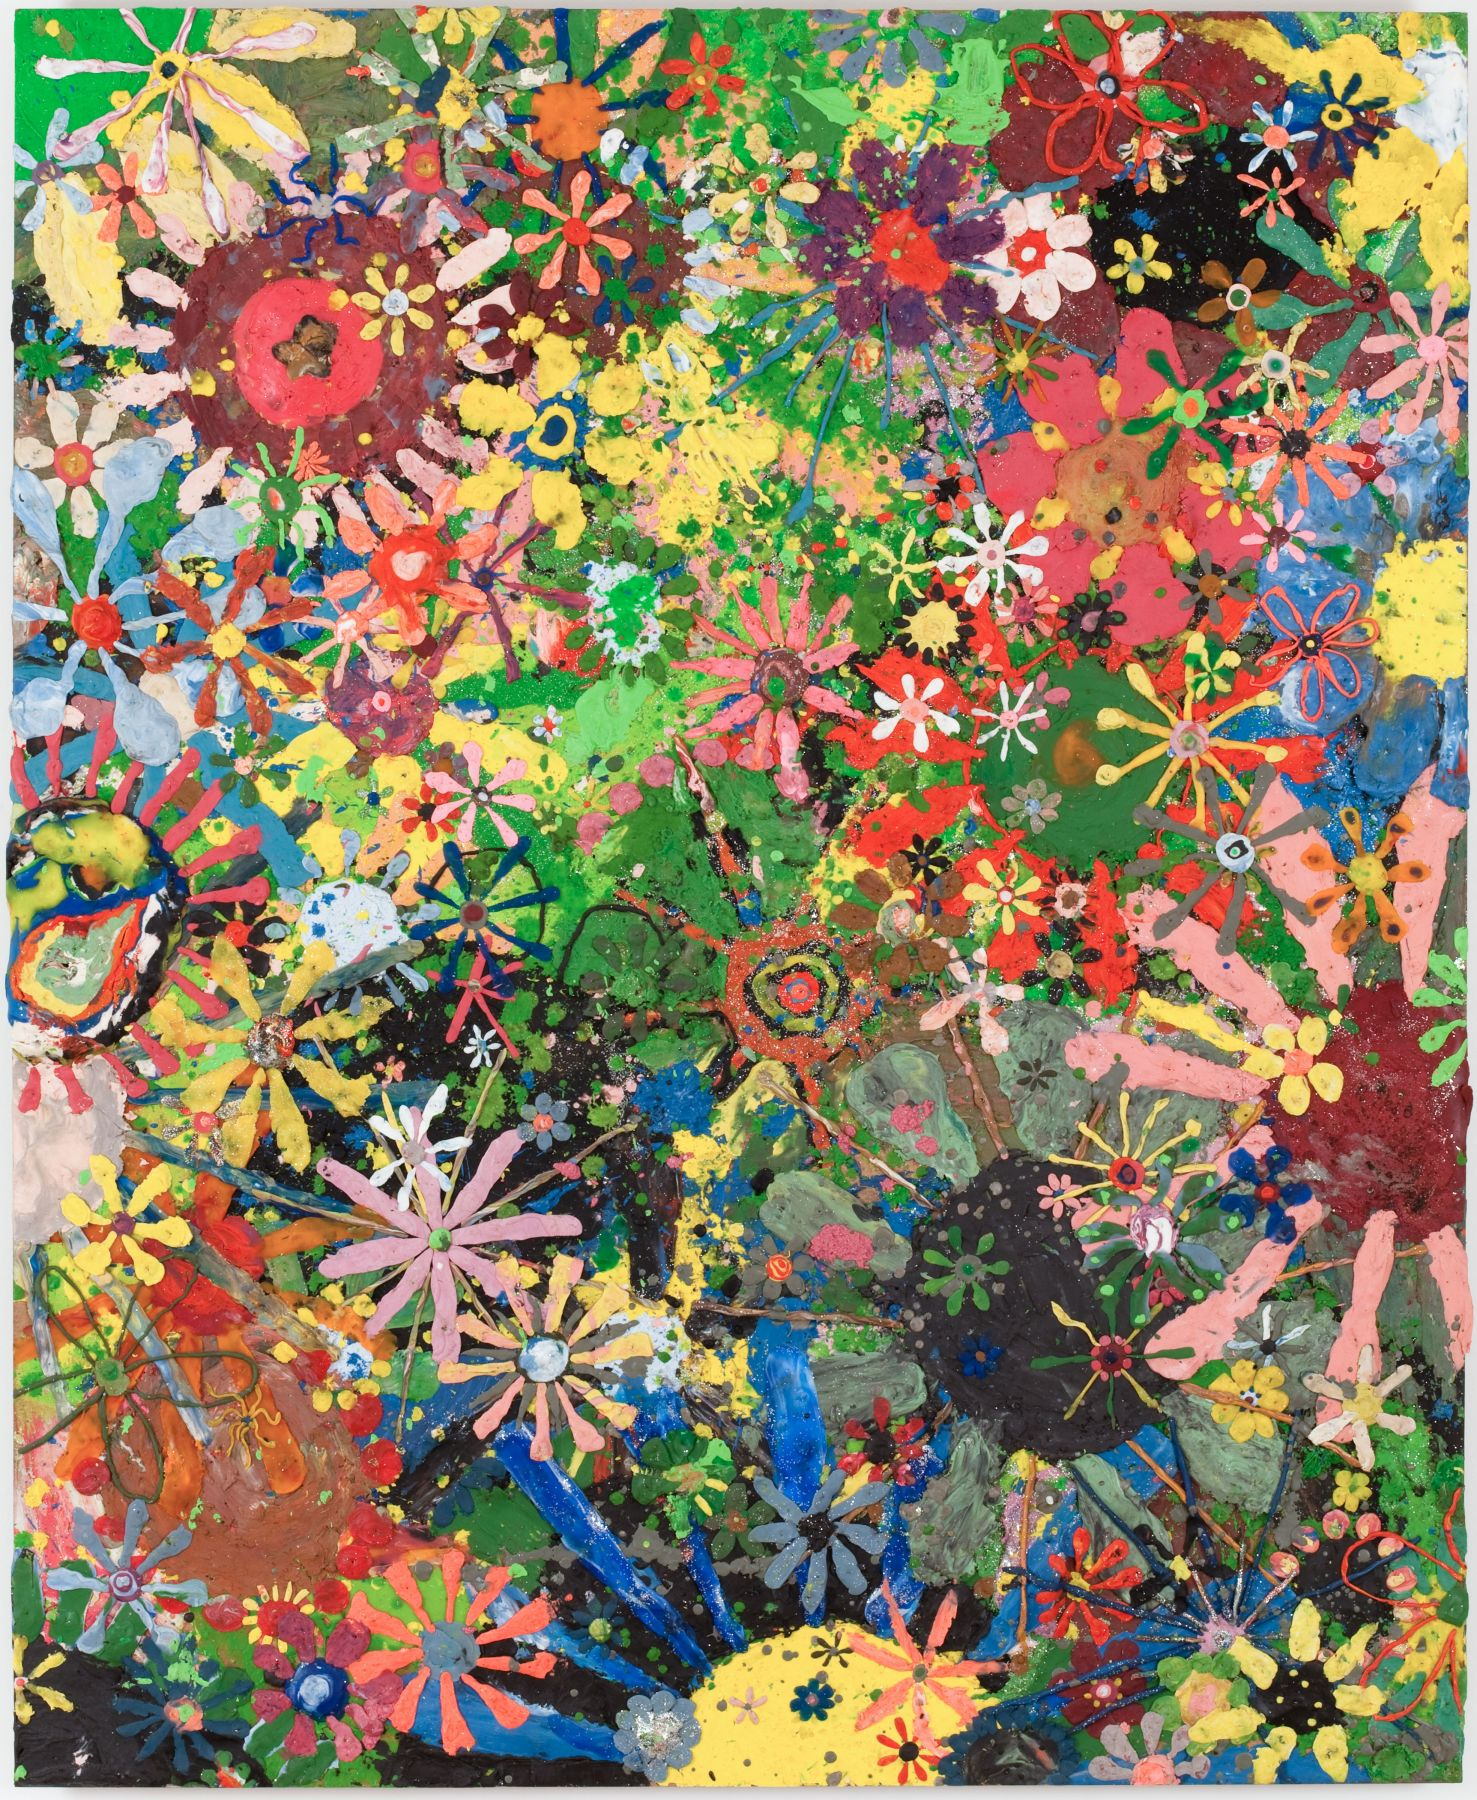 gelitin Flower painting, 2009 plasticine on wood panel 49 1/2 x 40 1/2 x 3/4 inches 126 x 103 x 2 cm